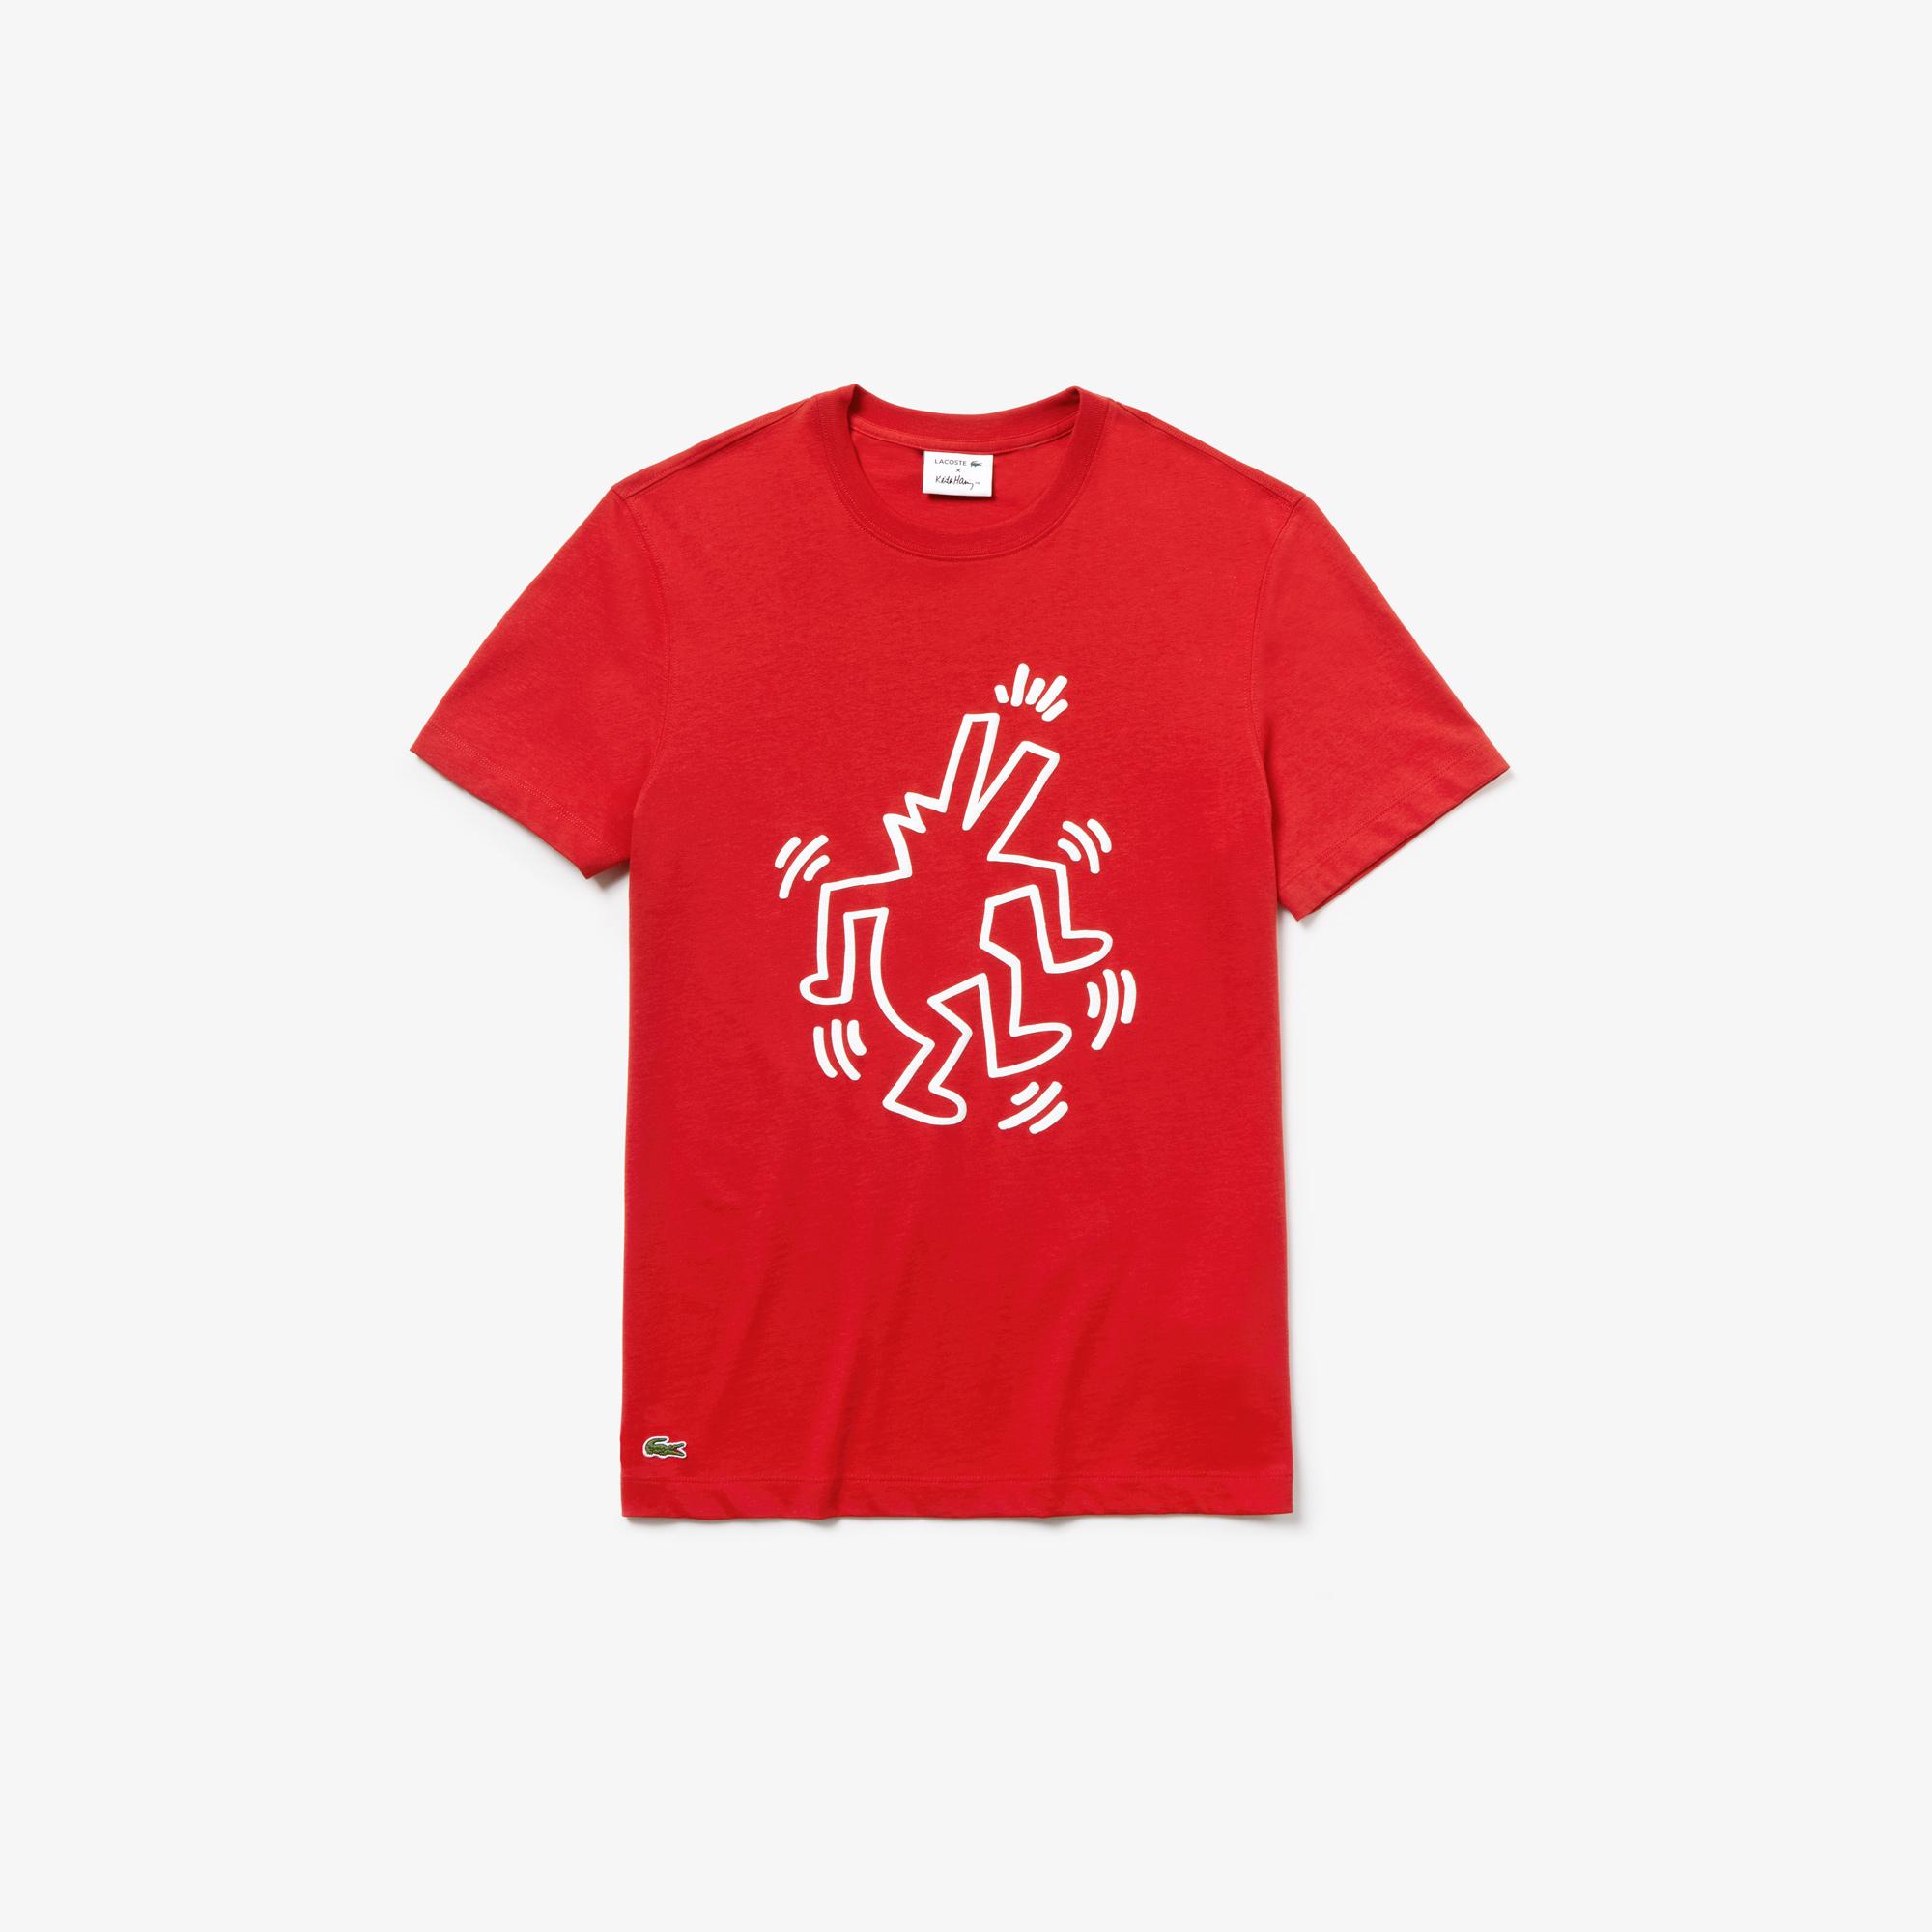 Short Sleeve Printed Jersey Tee Shirt $80 (2)